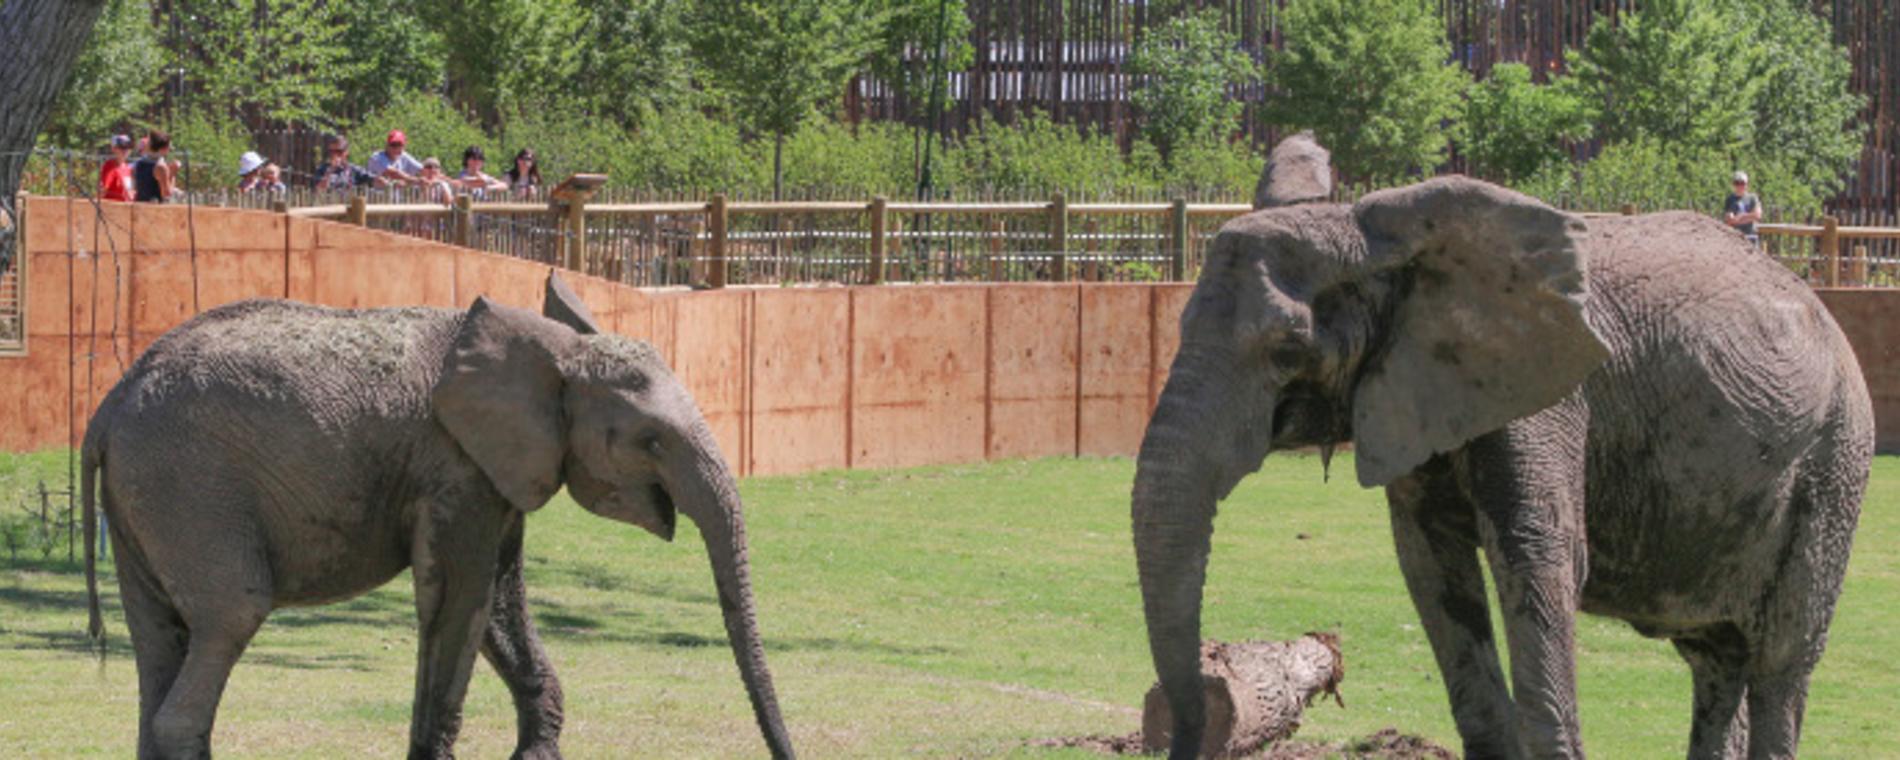 Elephants of the Zambezi River Valley - Arusi & Stephanie